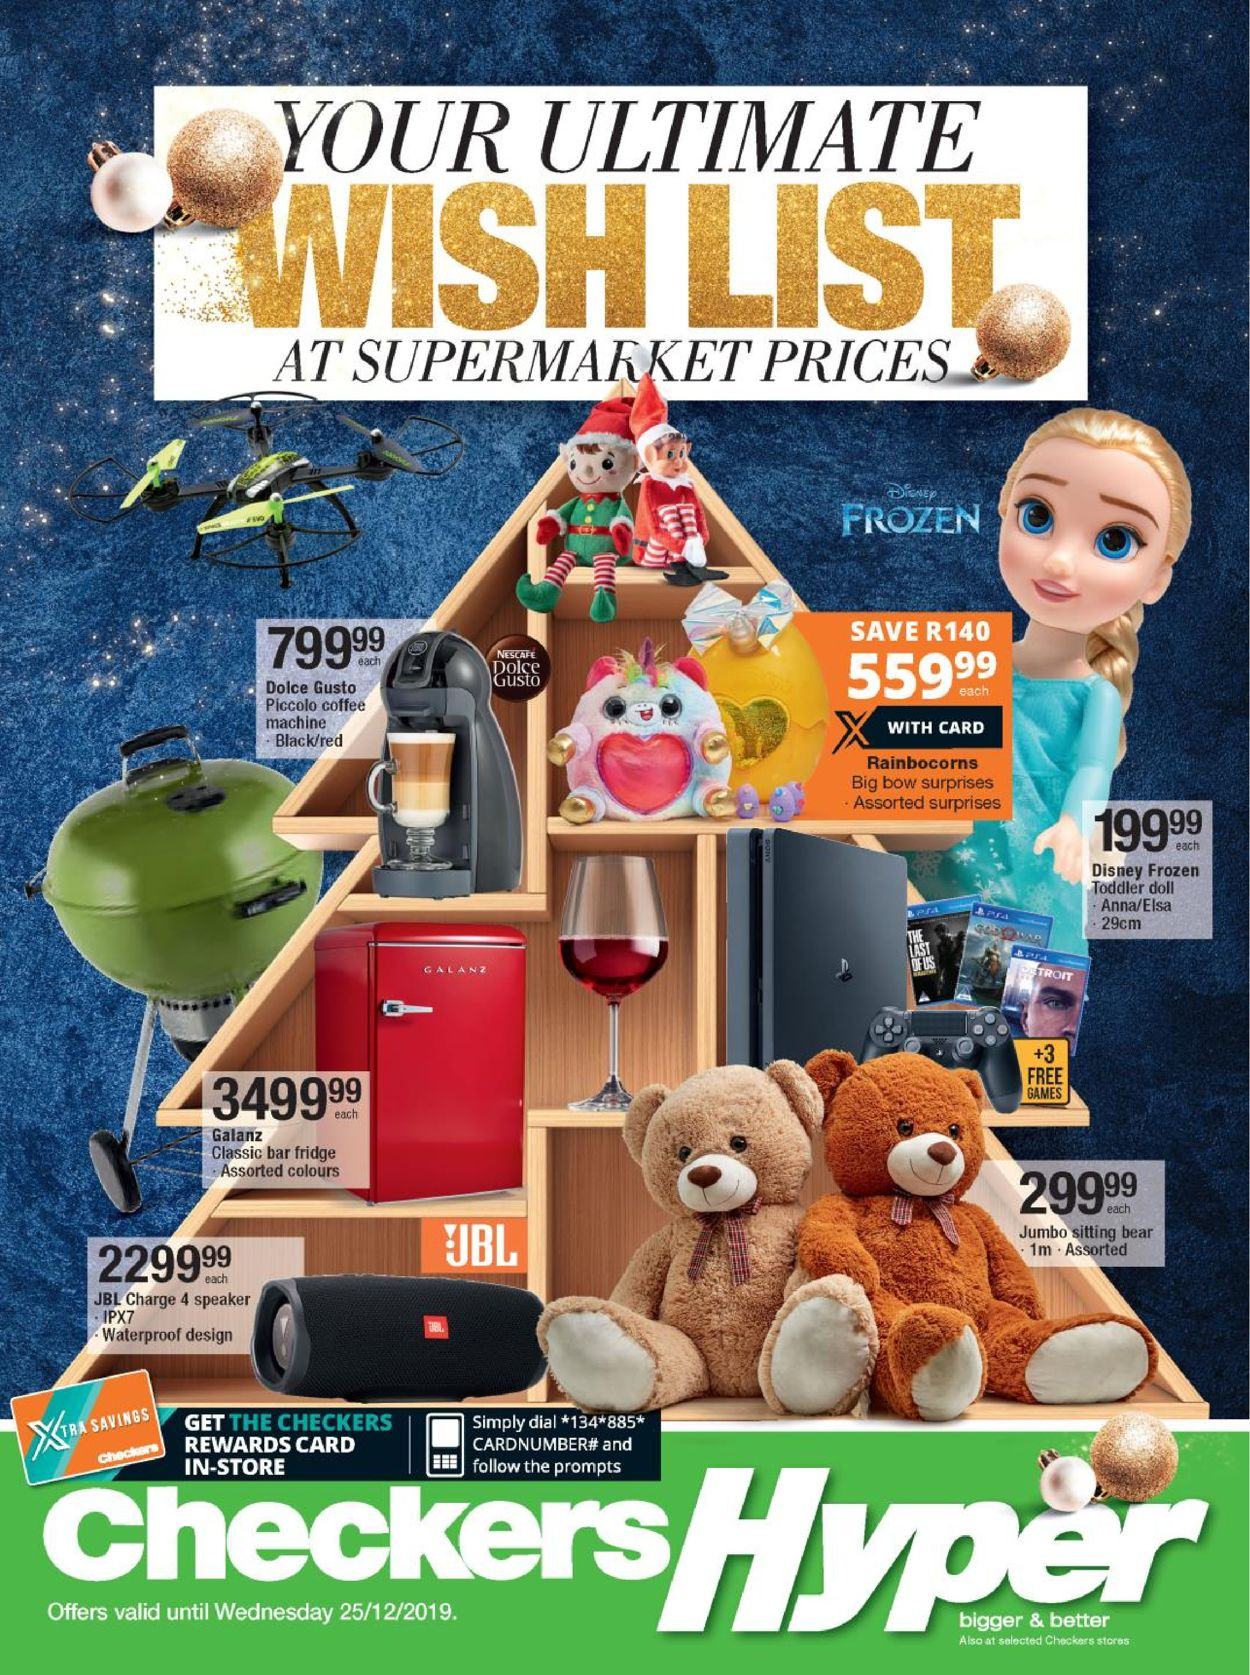 Checkers Christmas Catalogue 2019 Catalogue - 2019/11/18-2019/12/25